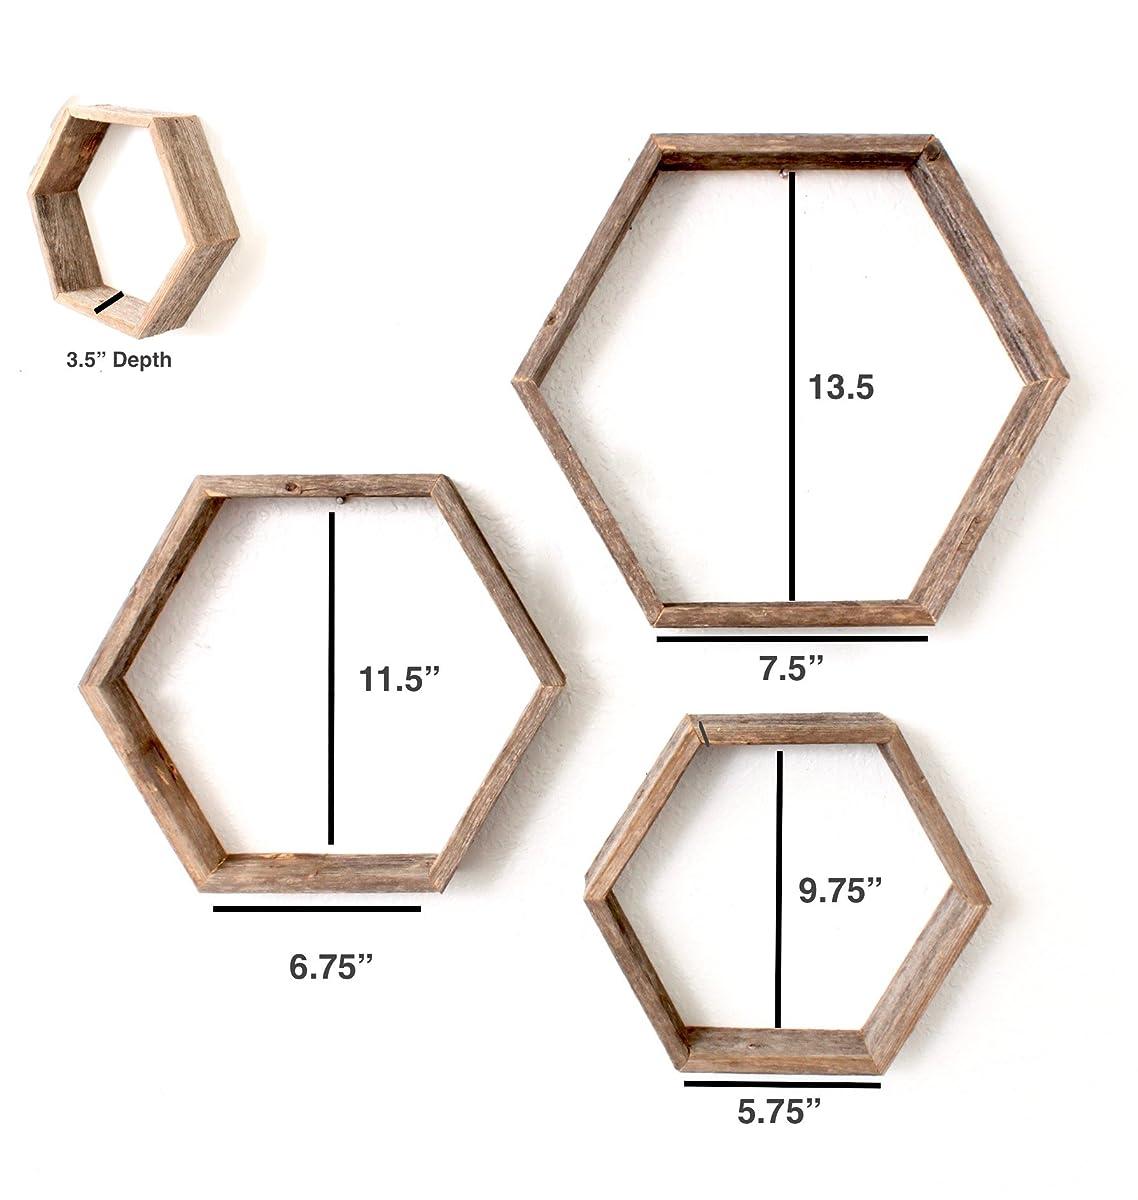 BarnwoodUSA Rustic Hexagon Set of 3 Shelves - 100 Percent Reclaimed Wood, Weathered Gray